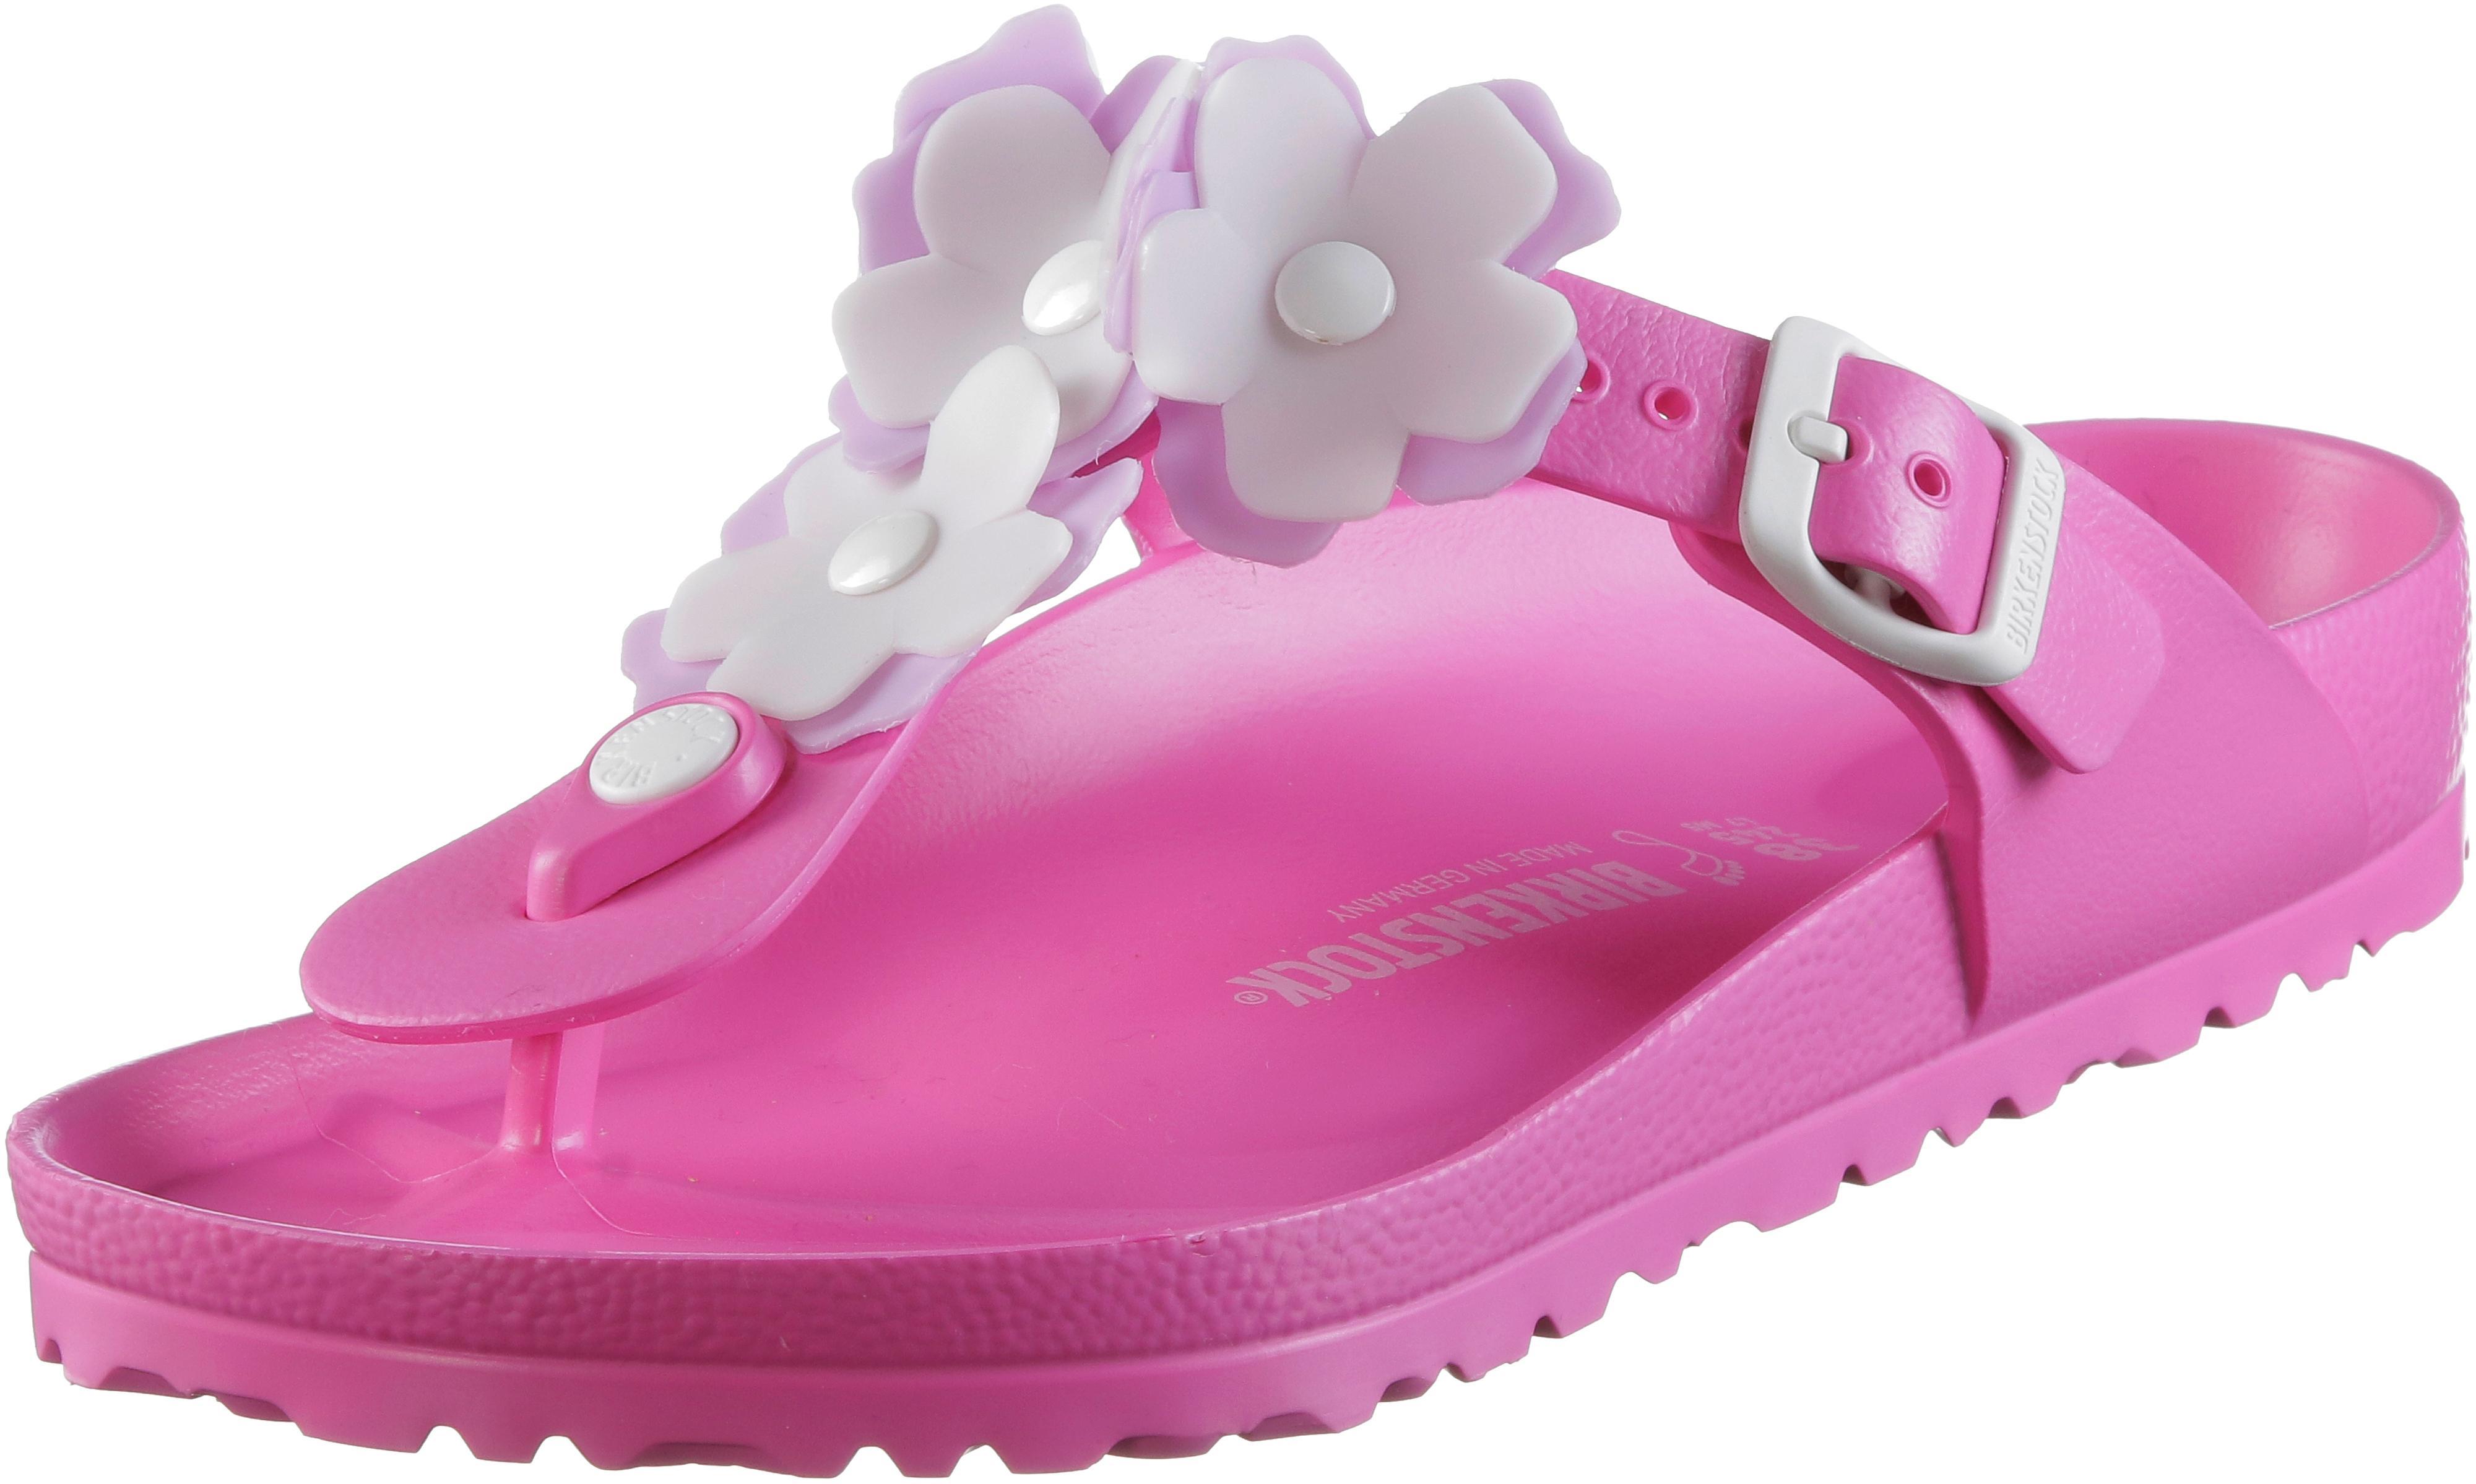 Online Birkenstock Eva Gizeh Sandalen Neon Pink Damen Flower